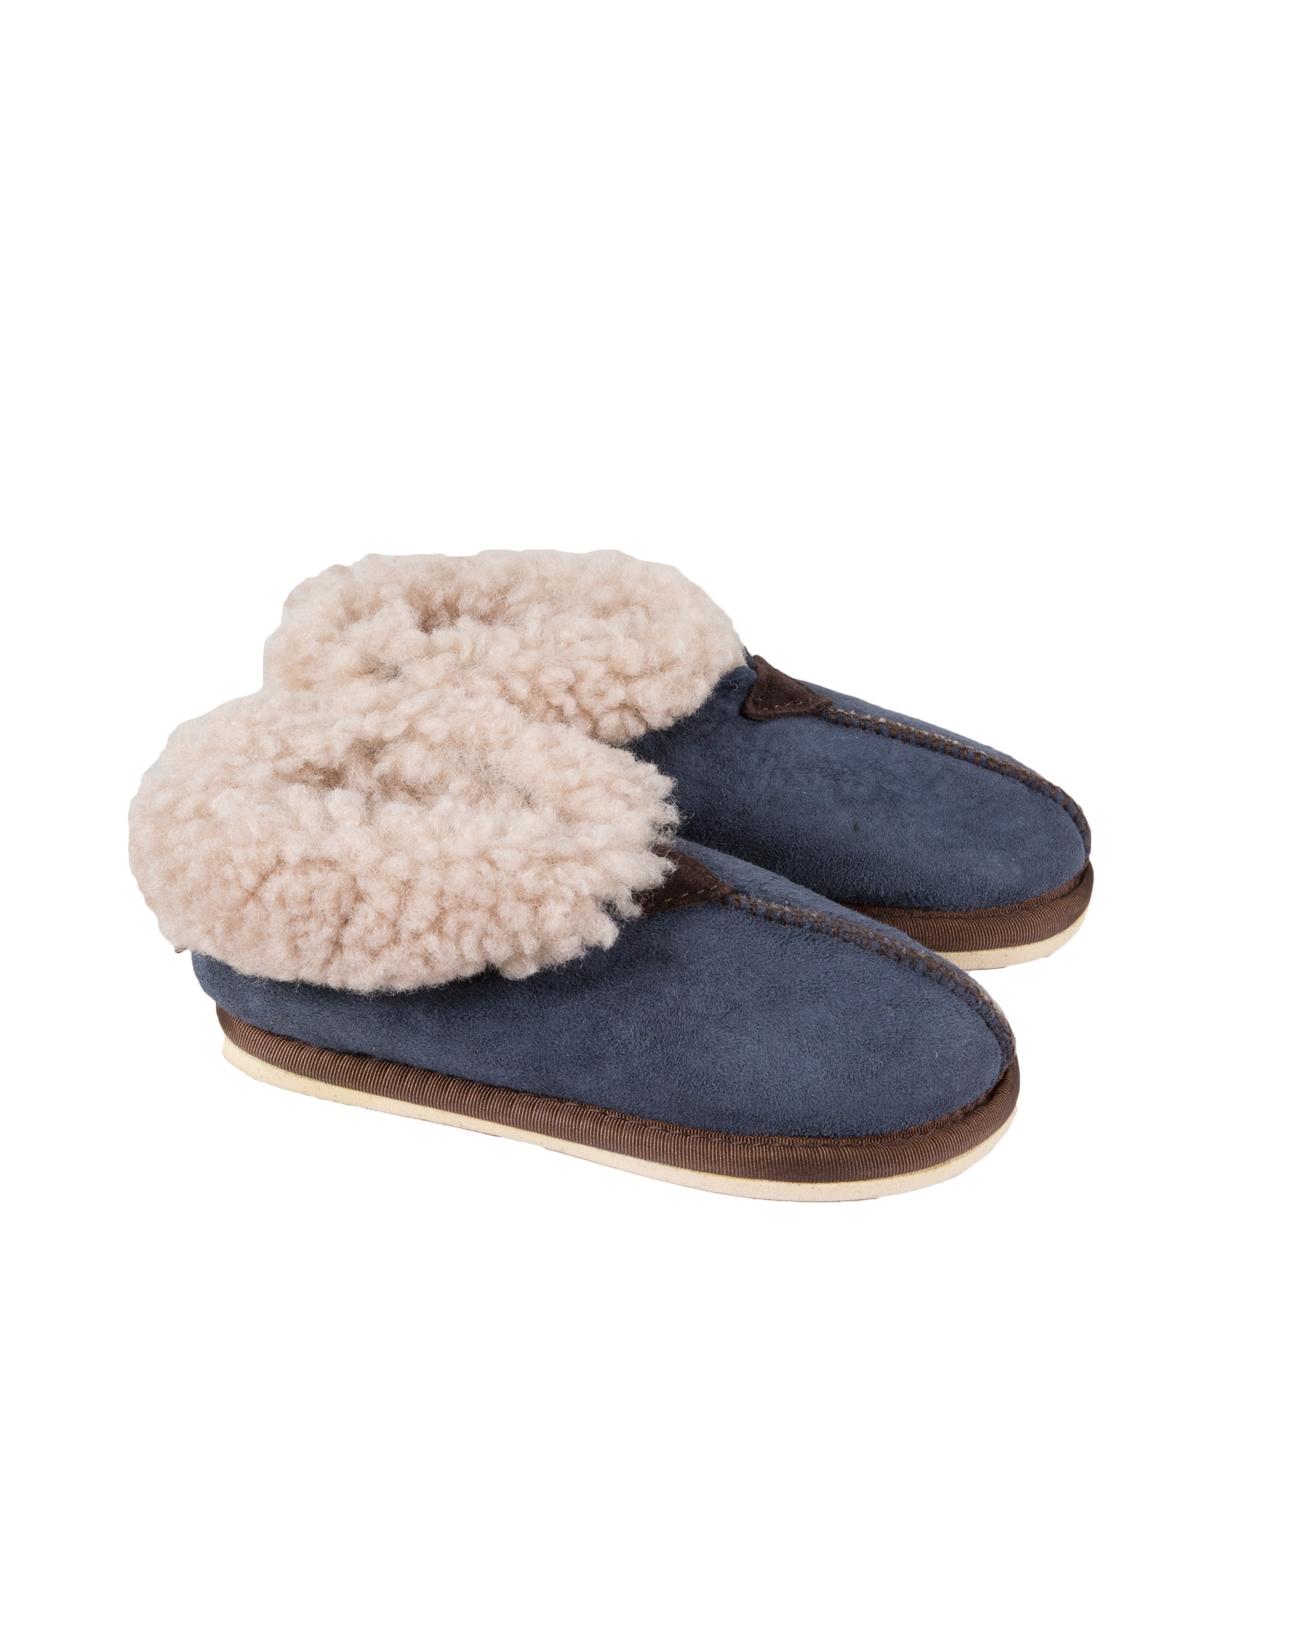 Kids Bootee Slipper - Size 9-10 - Blue